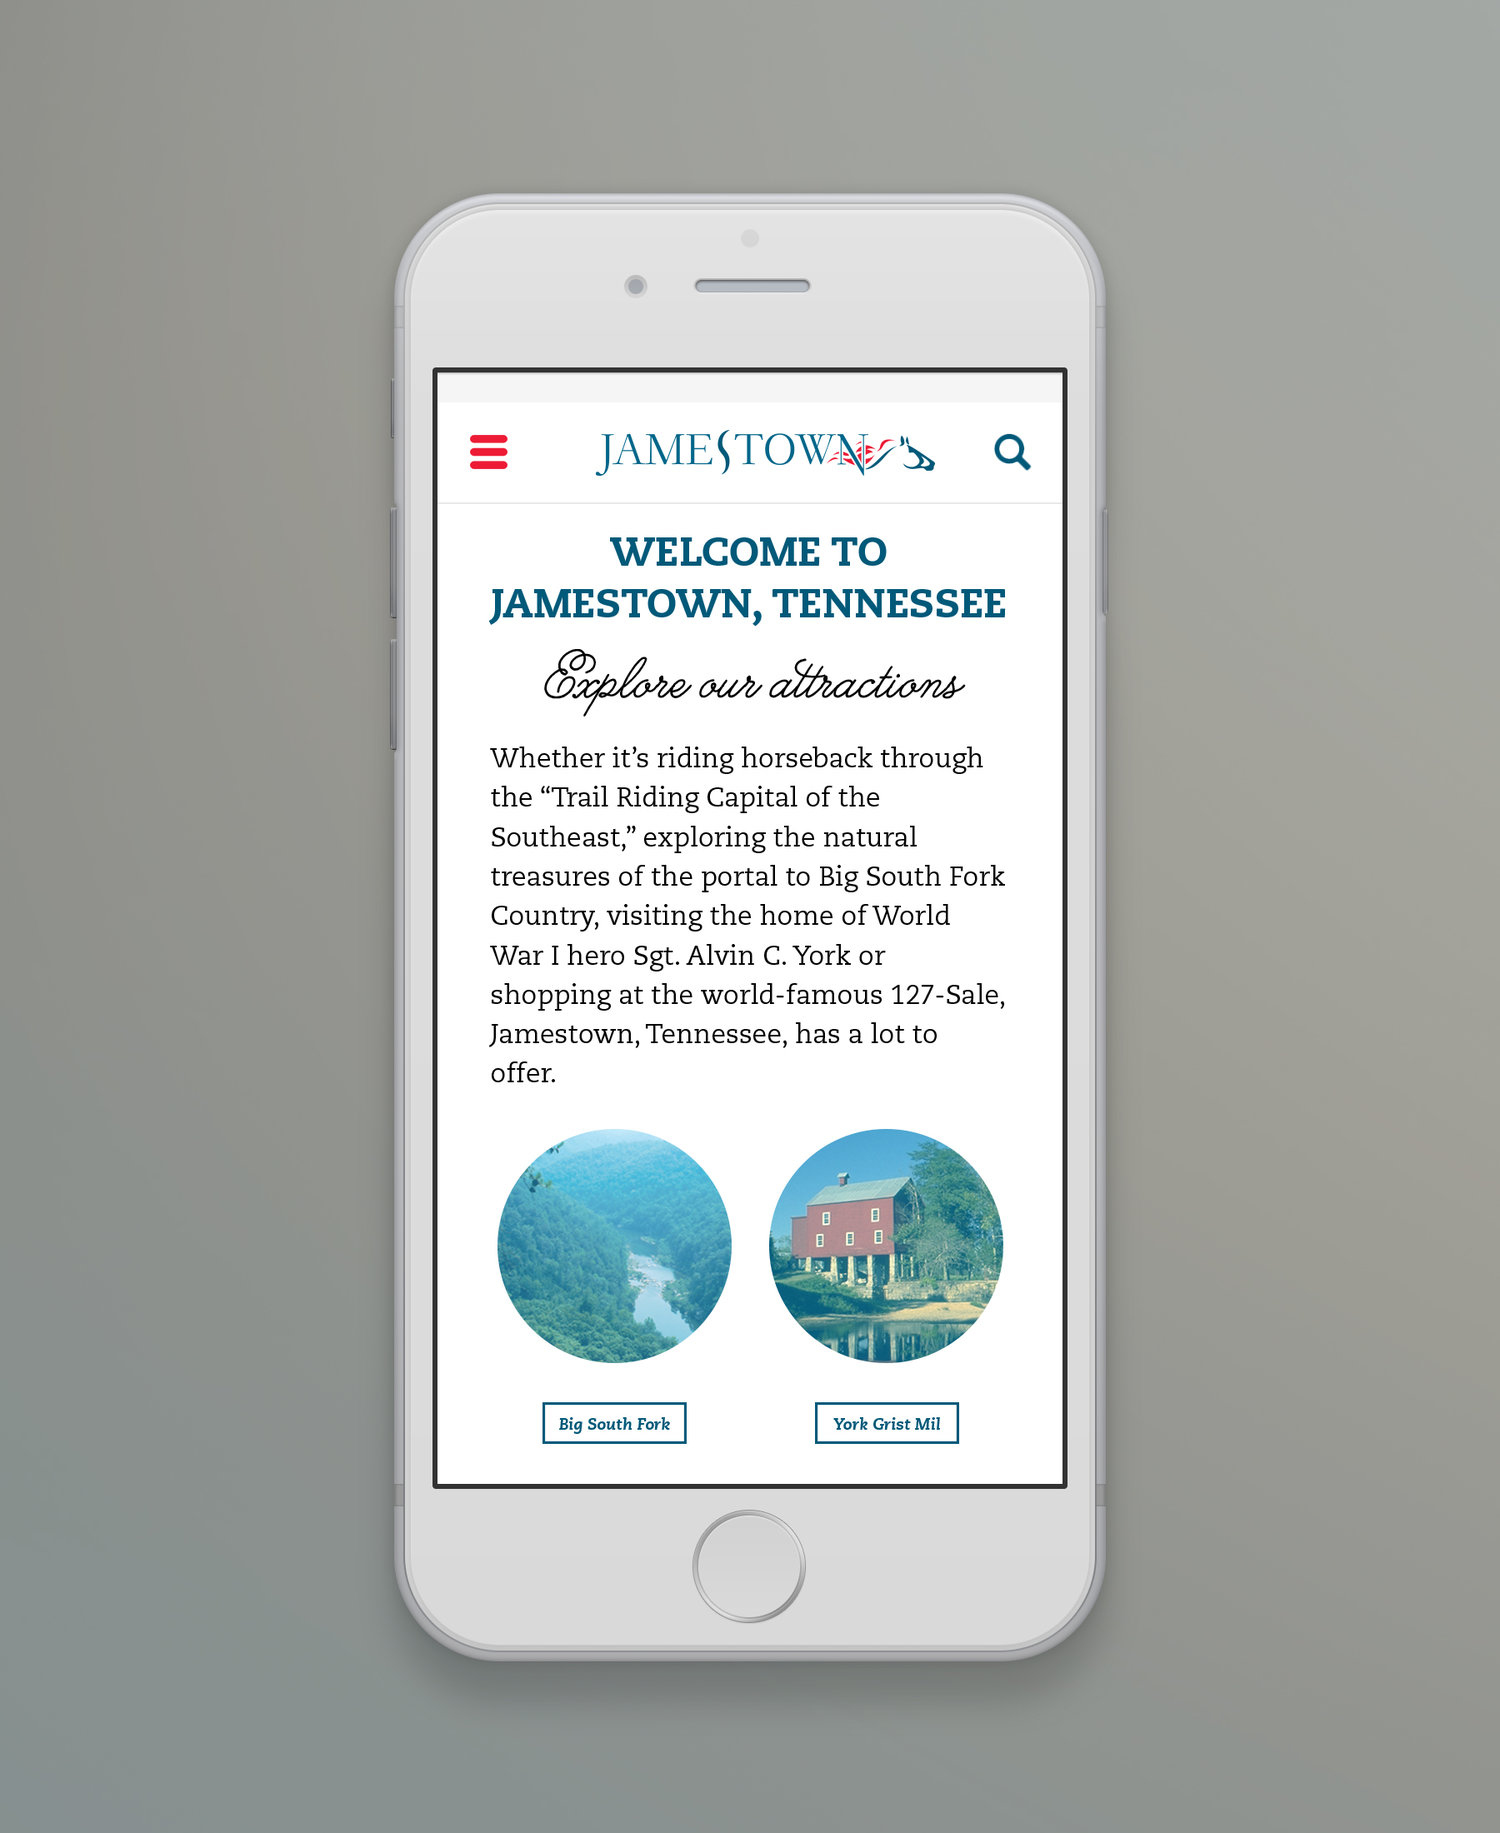 Web Design | Jamestown - Welcome to Jamestown, TN (Mobile View - iPhone Mockup)